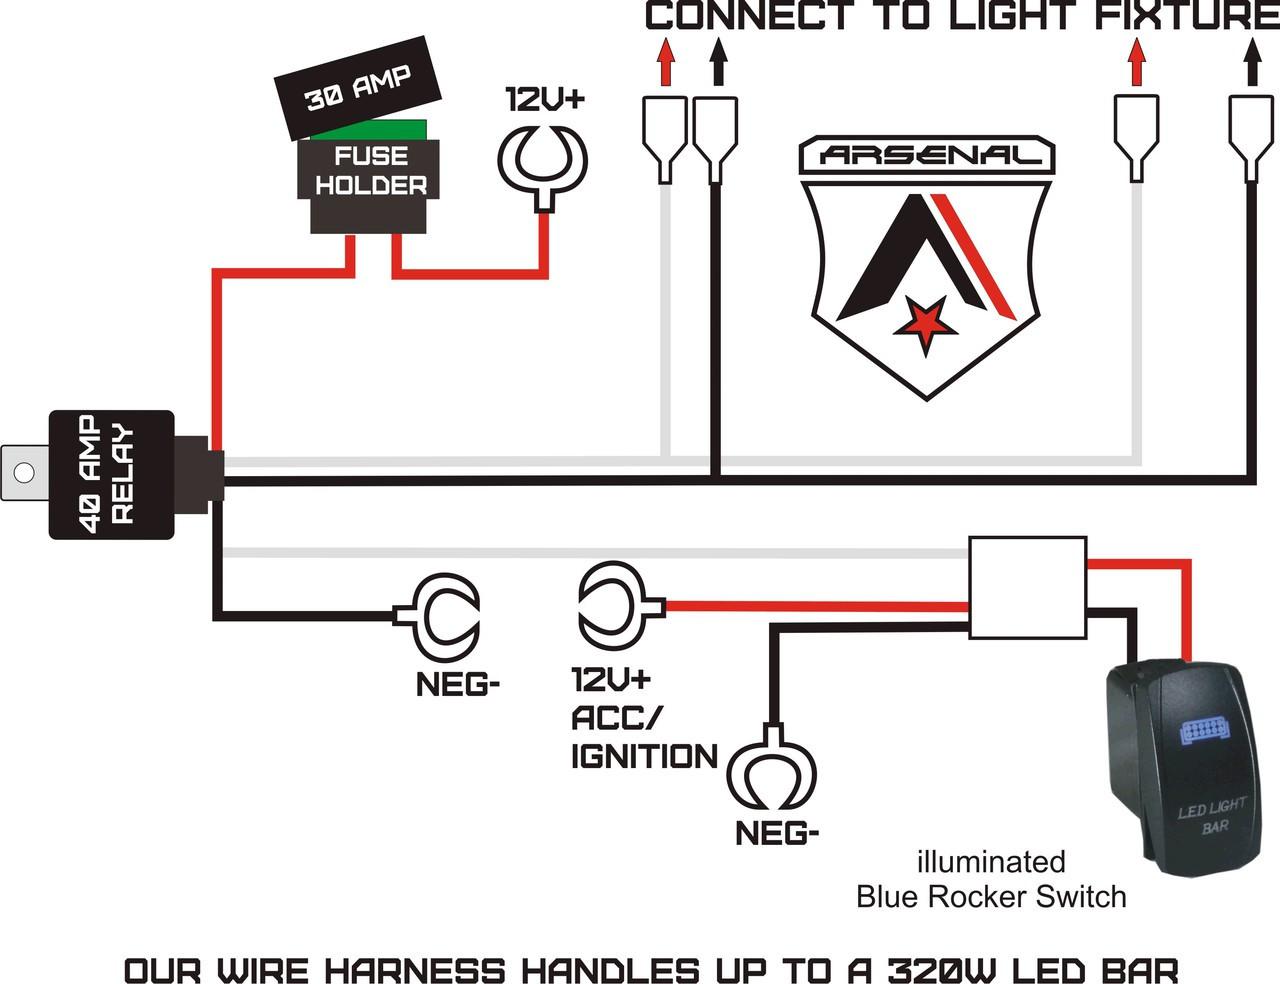 hight resolution of  1 40 inch led cree light bar by arsenal offroad 228w spot flood combo beam offroad trucks 4x4 jeep trucks utv suv 4x4 polaris razor 1000 tractor raptor